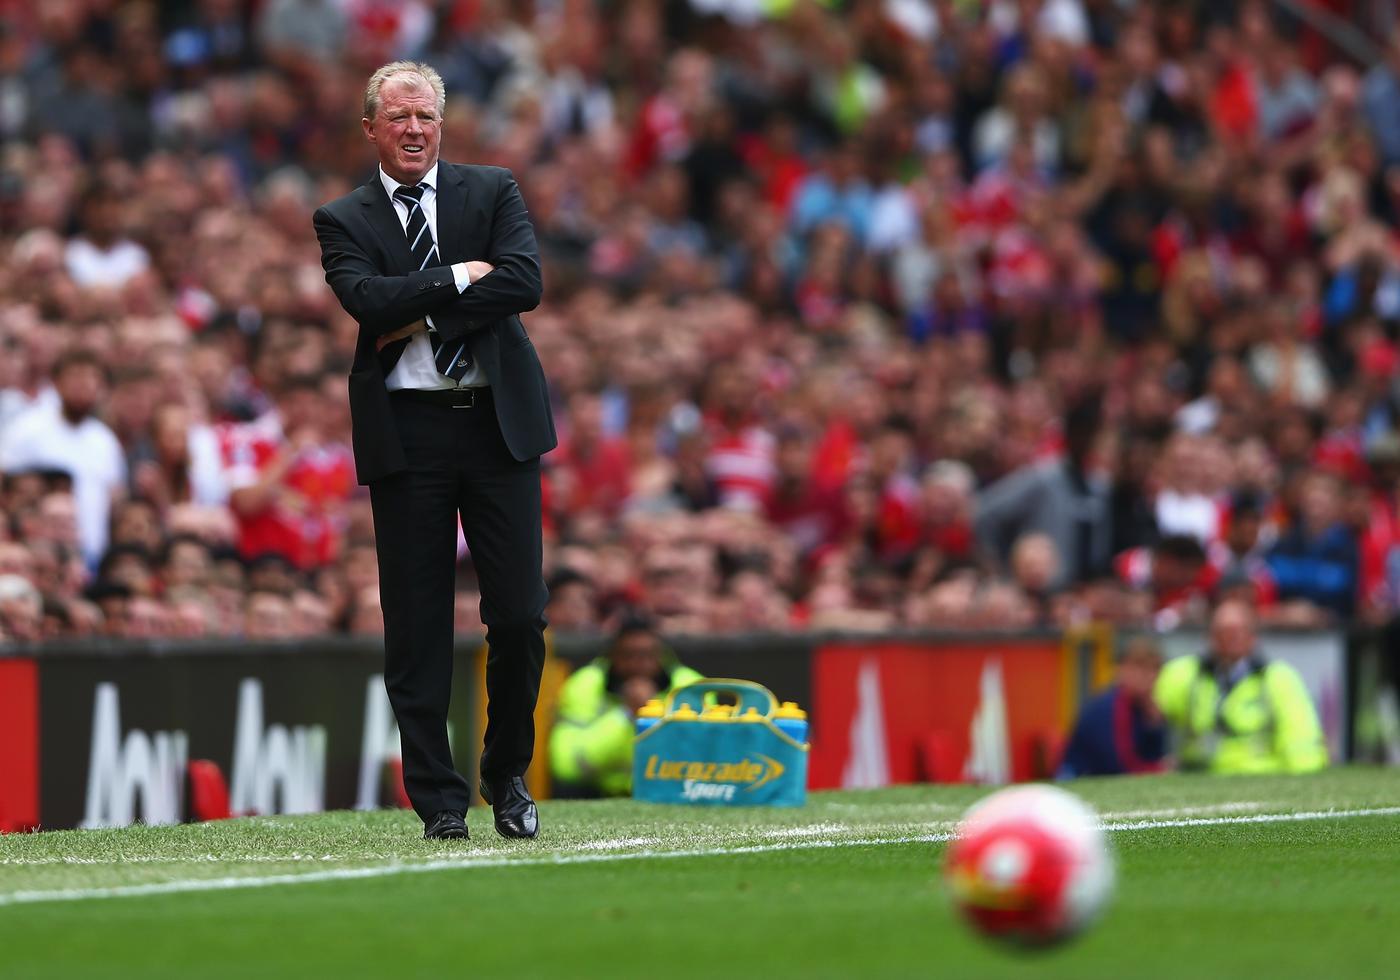 Newcastle United boss Steve McClaren gets a chance of redemption as he faces Slaven Bilic's West Ham United